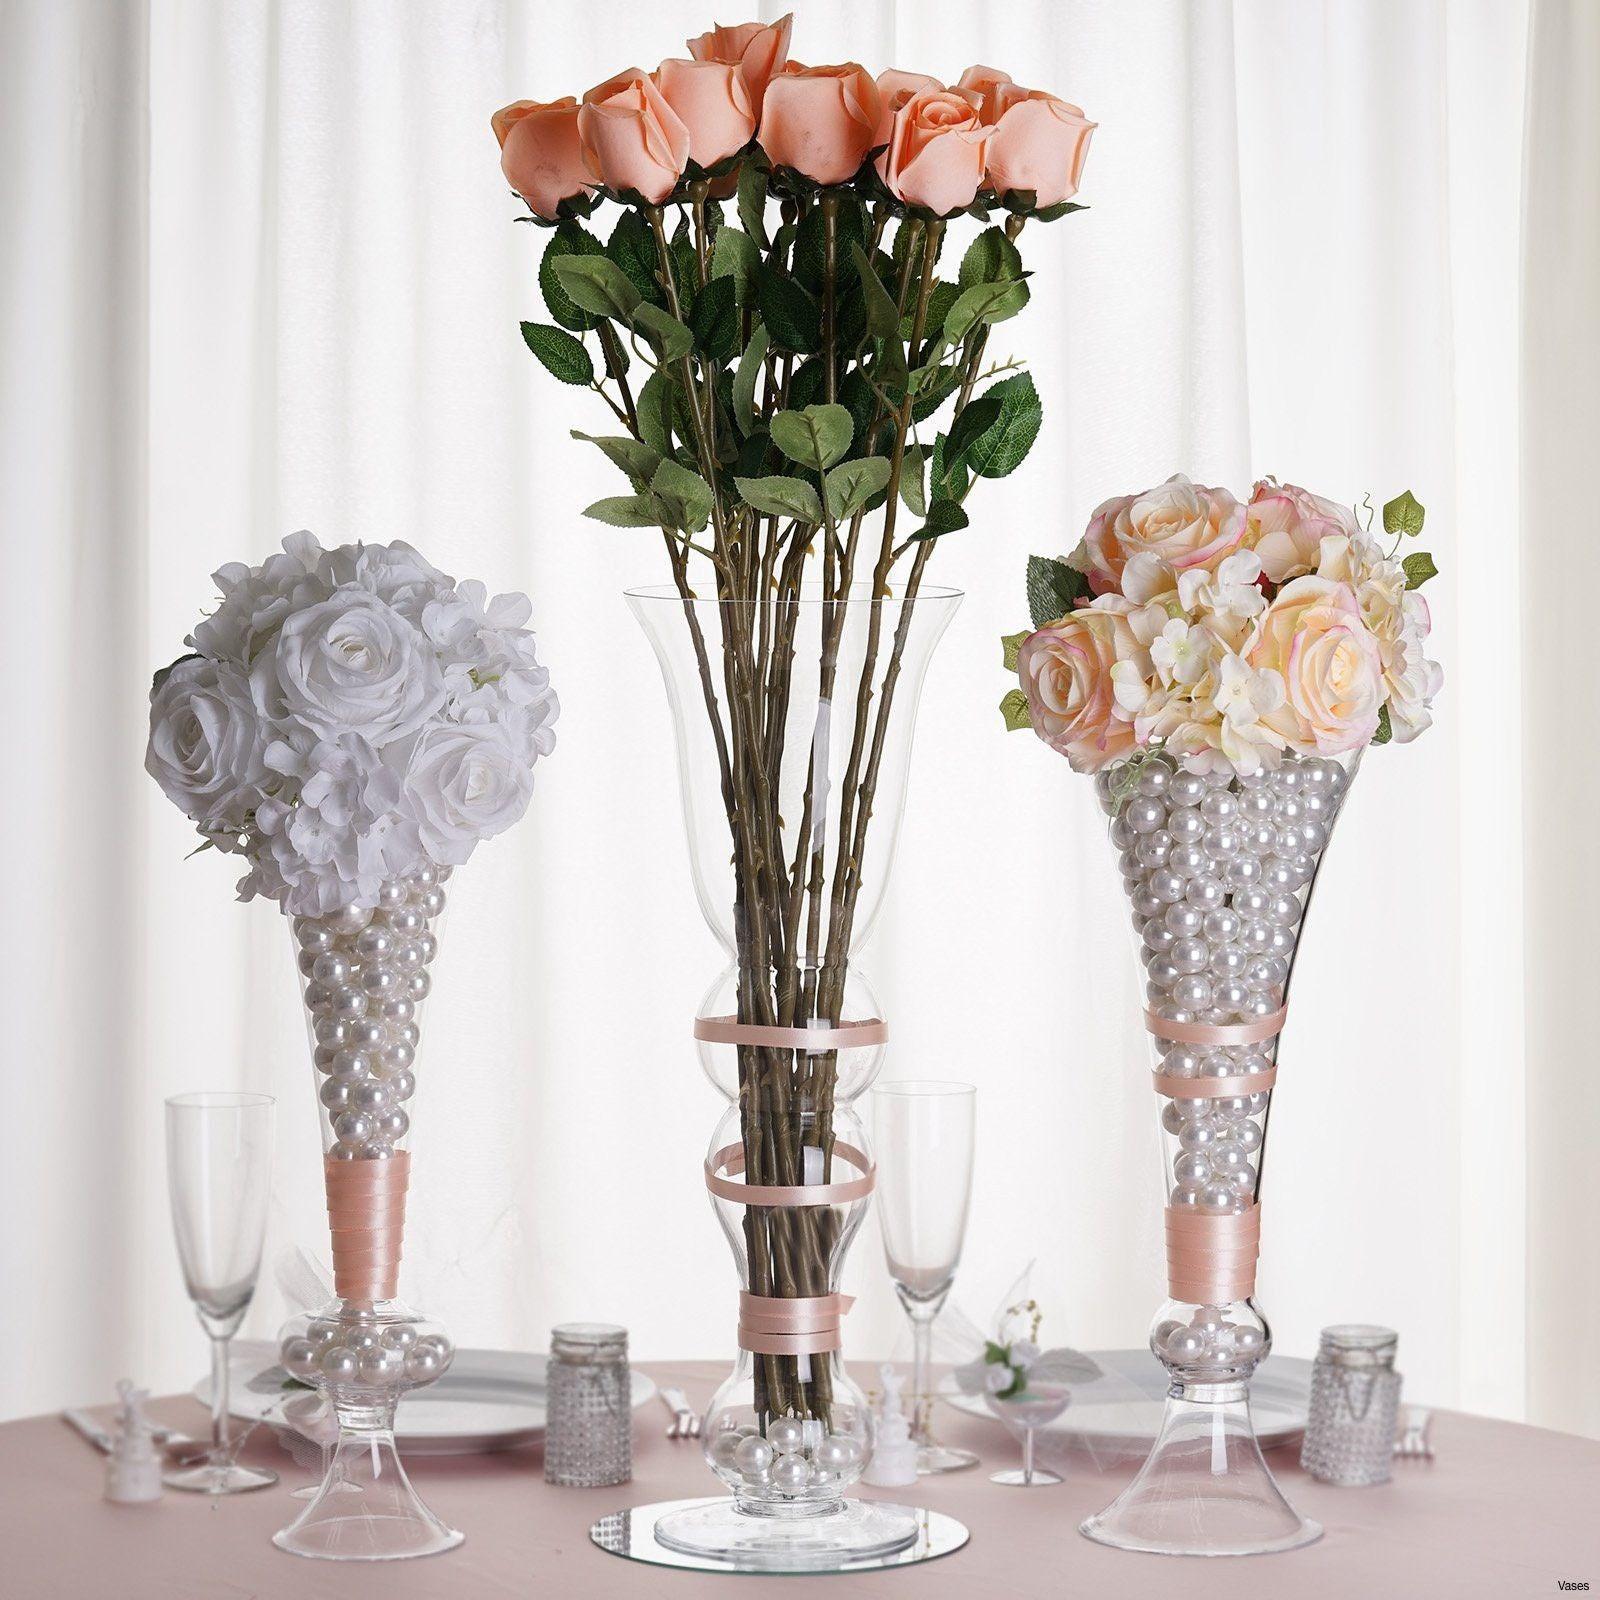 vw flower vase of clear flower vase luxury house clipart unique flower vase table 04h for clear flower vase luxury house clipart unique flower vase table 04h vases tablei 0d